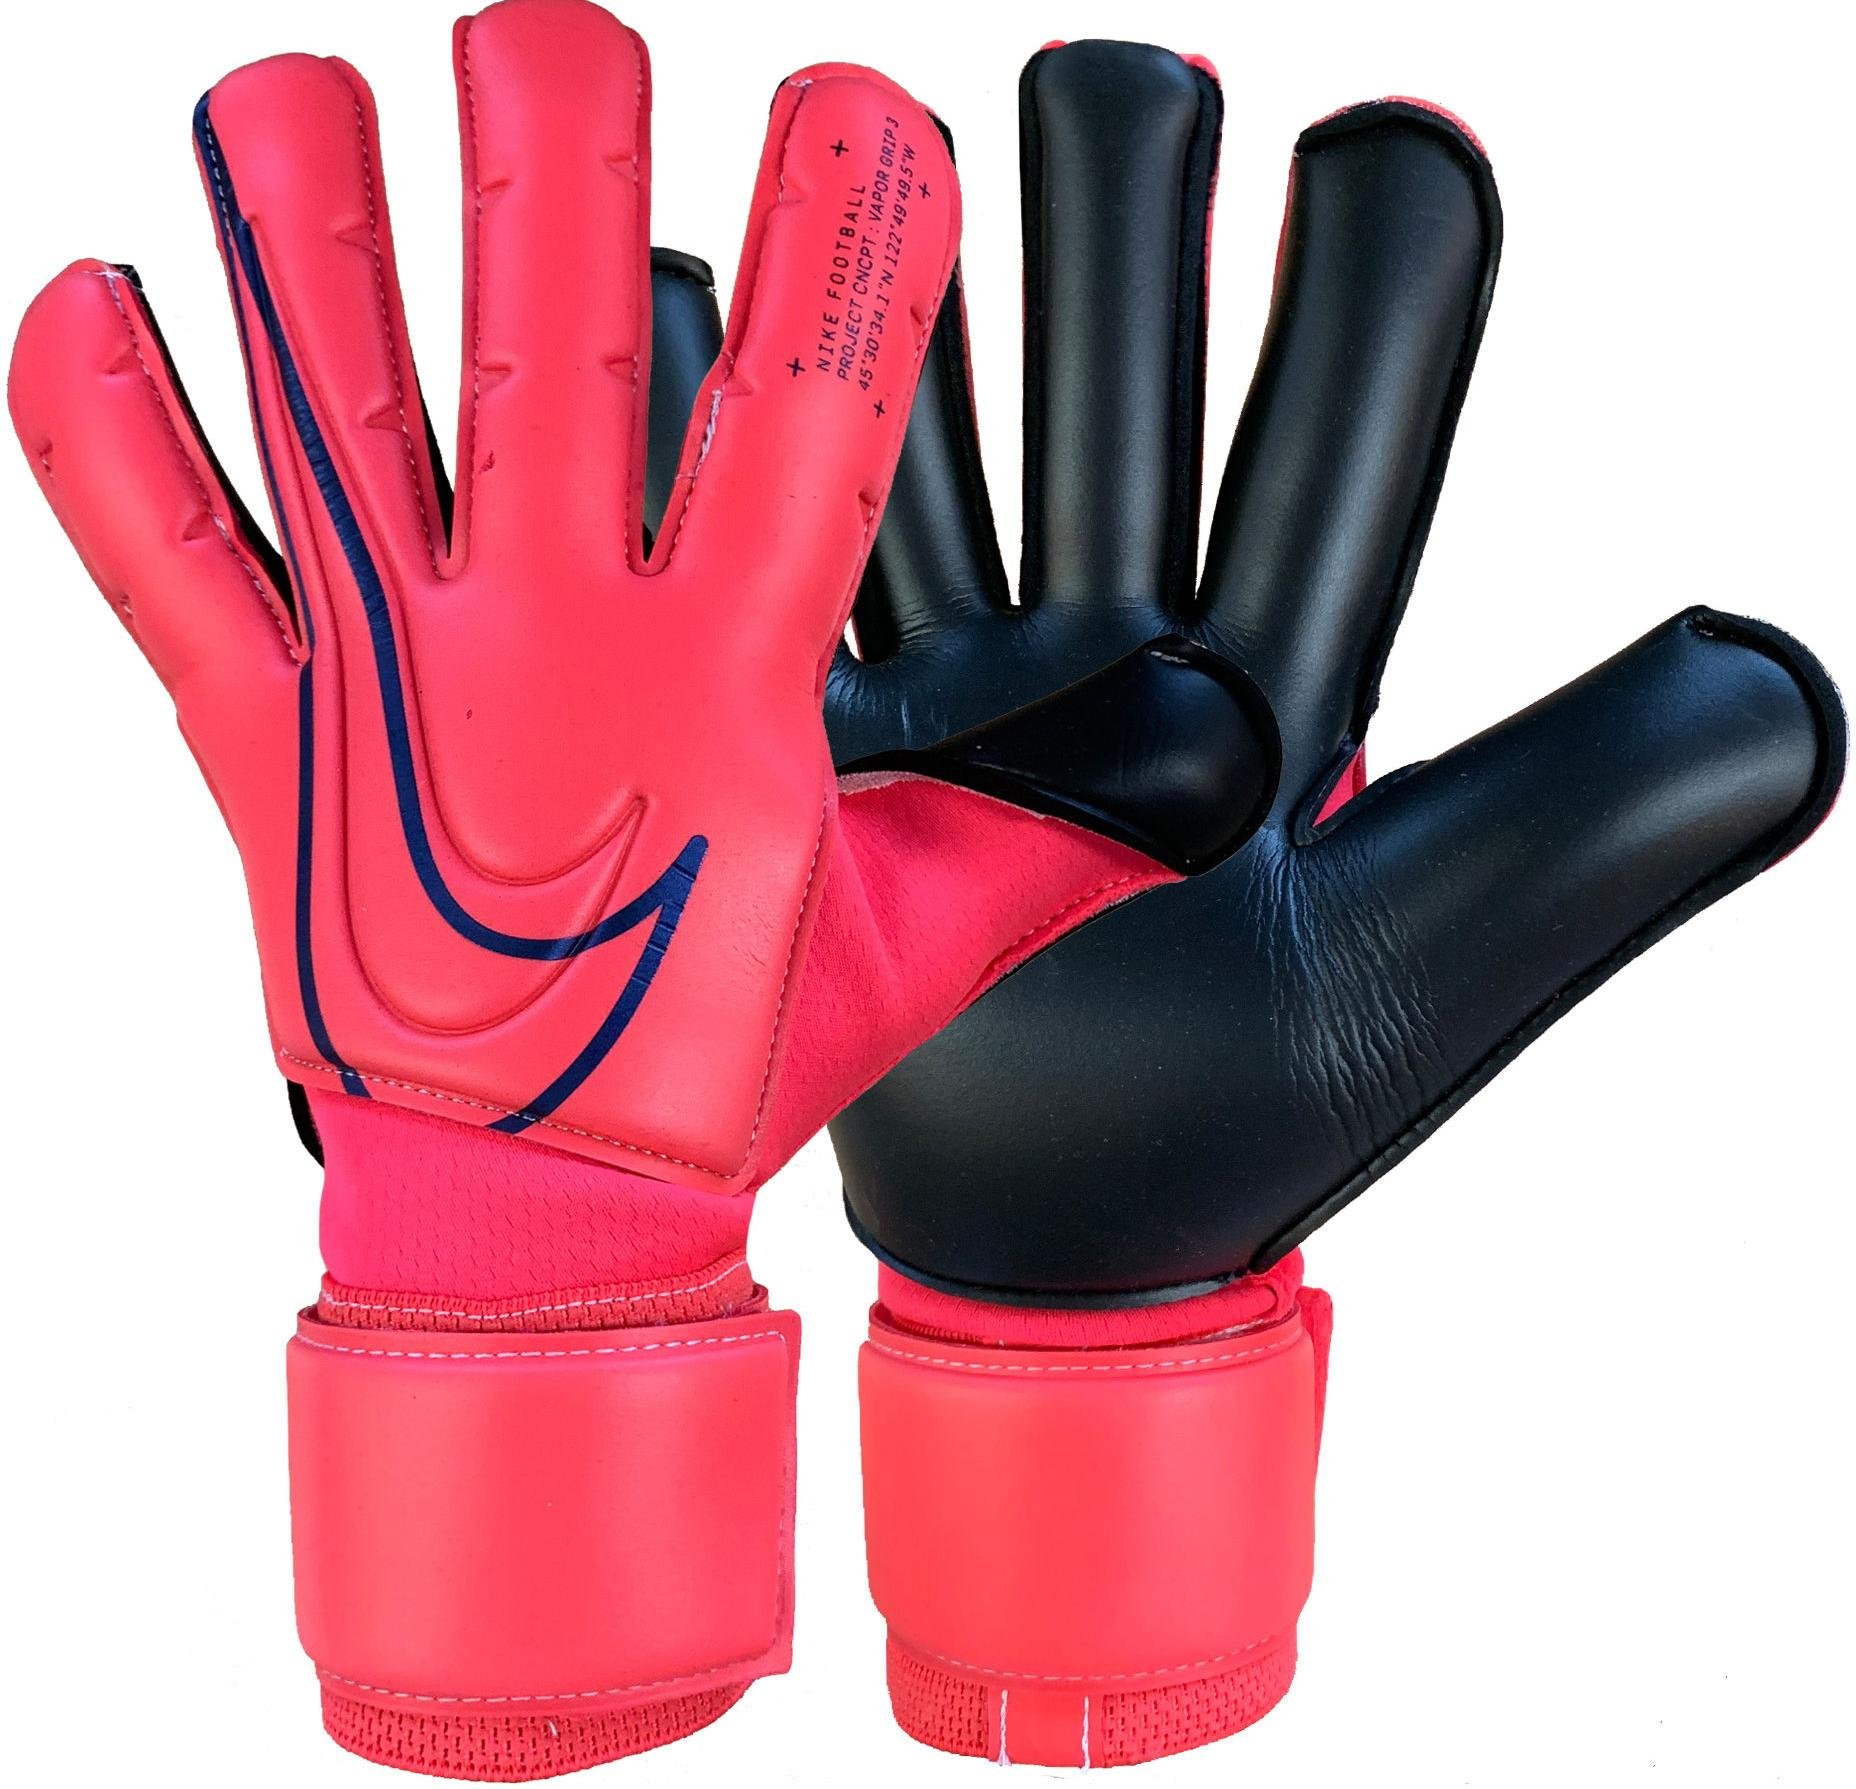 gloves Nike vapor grip 3 rs promo